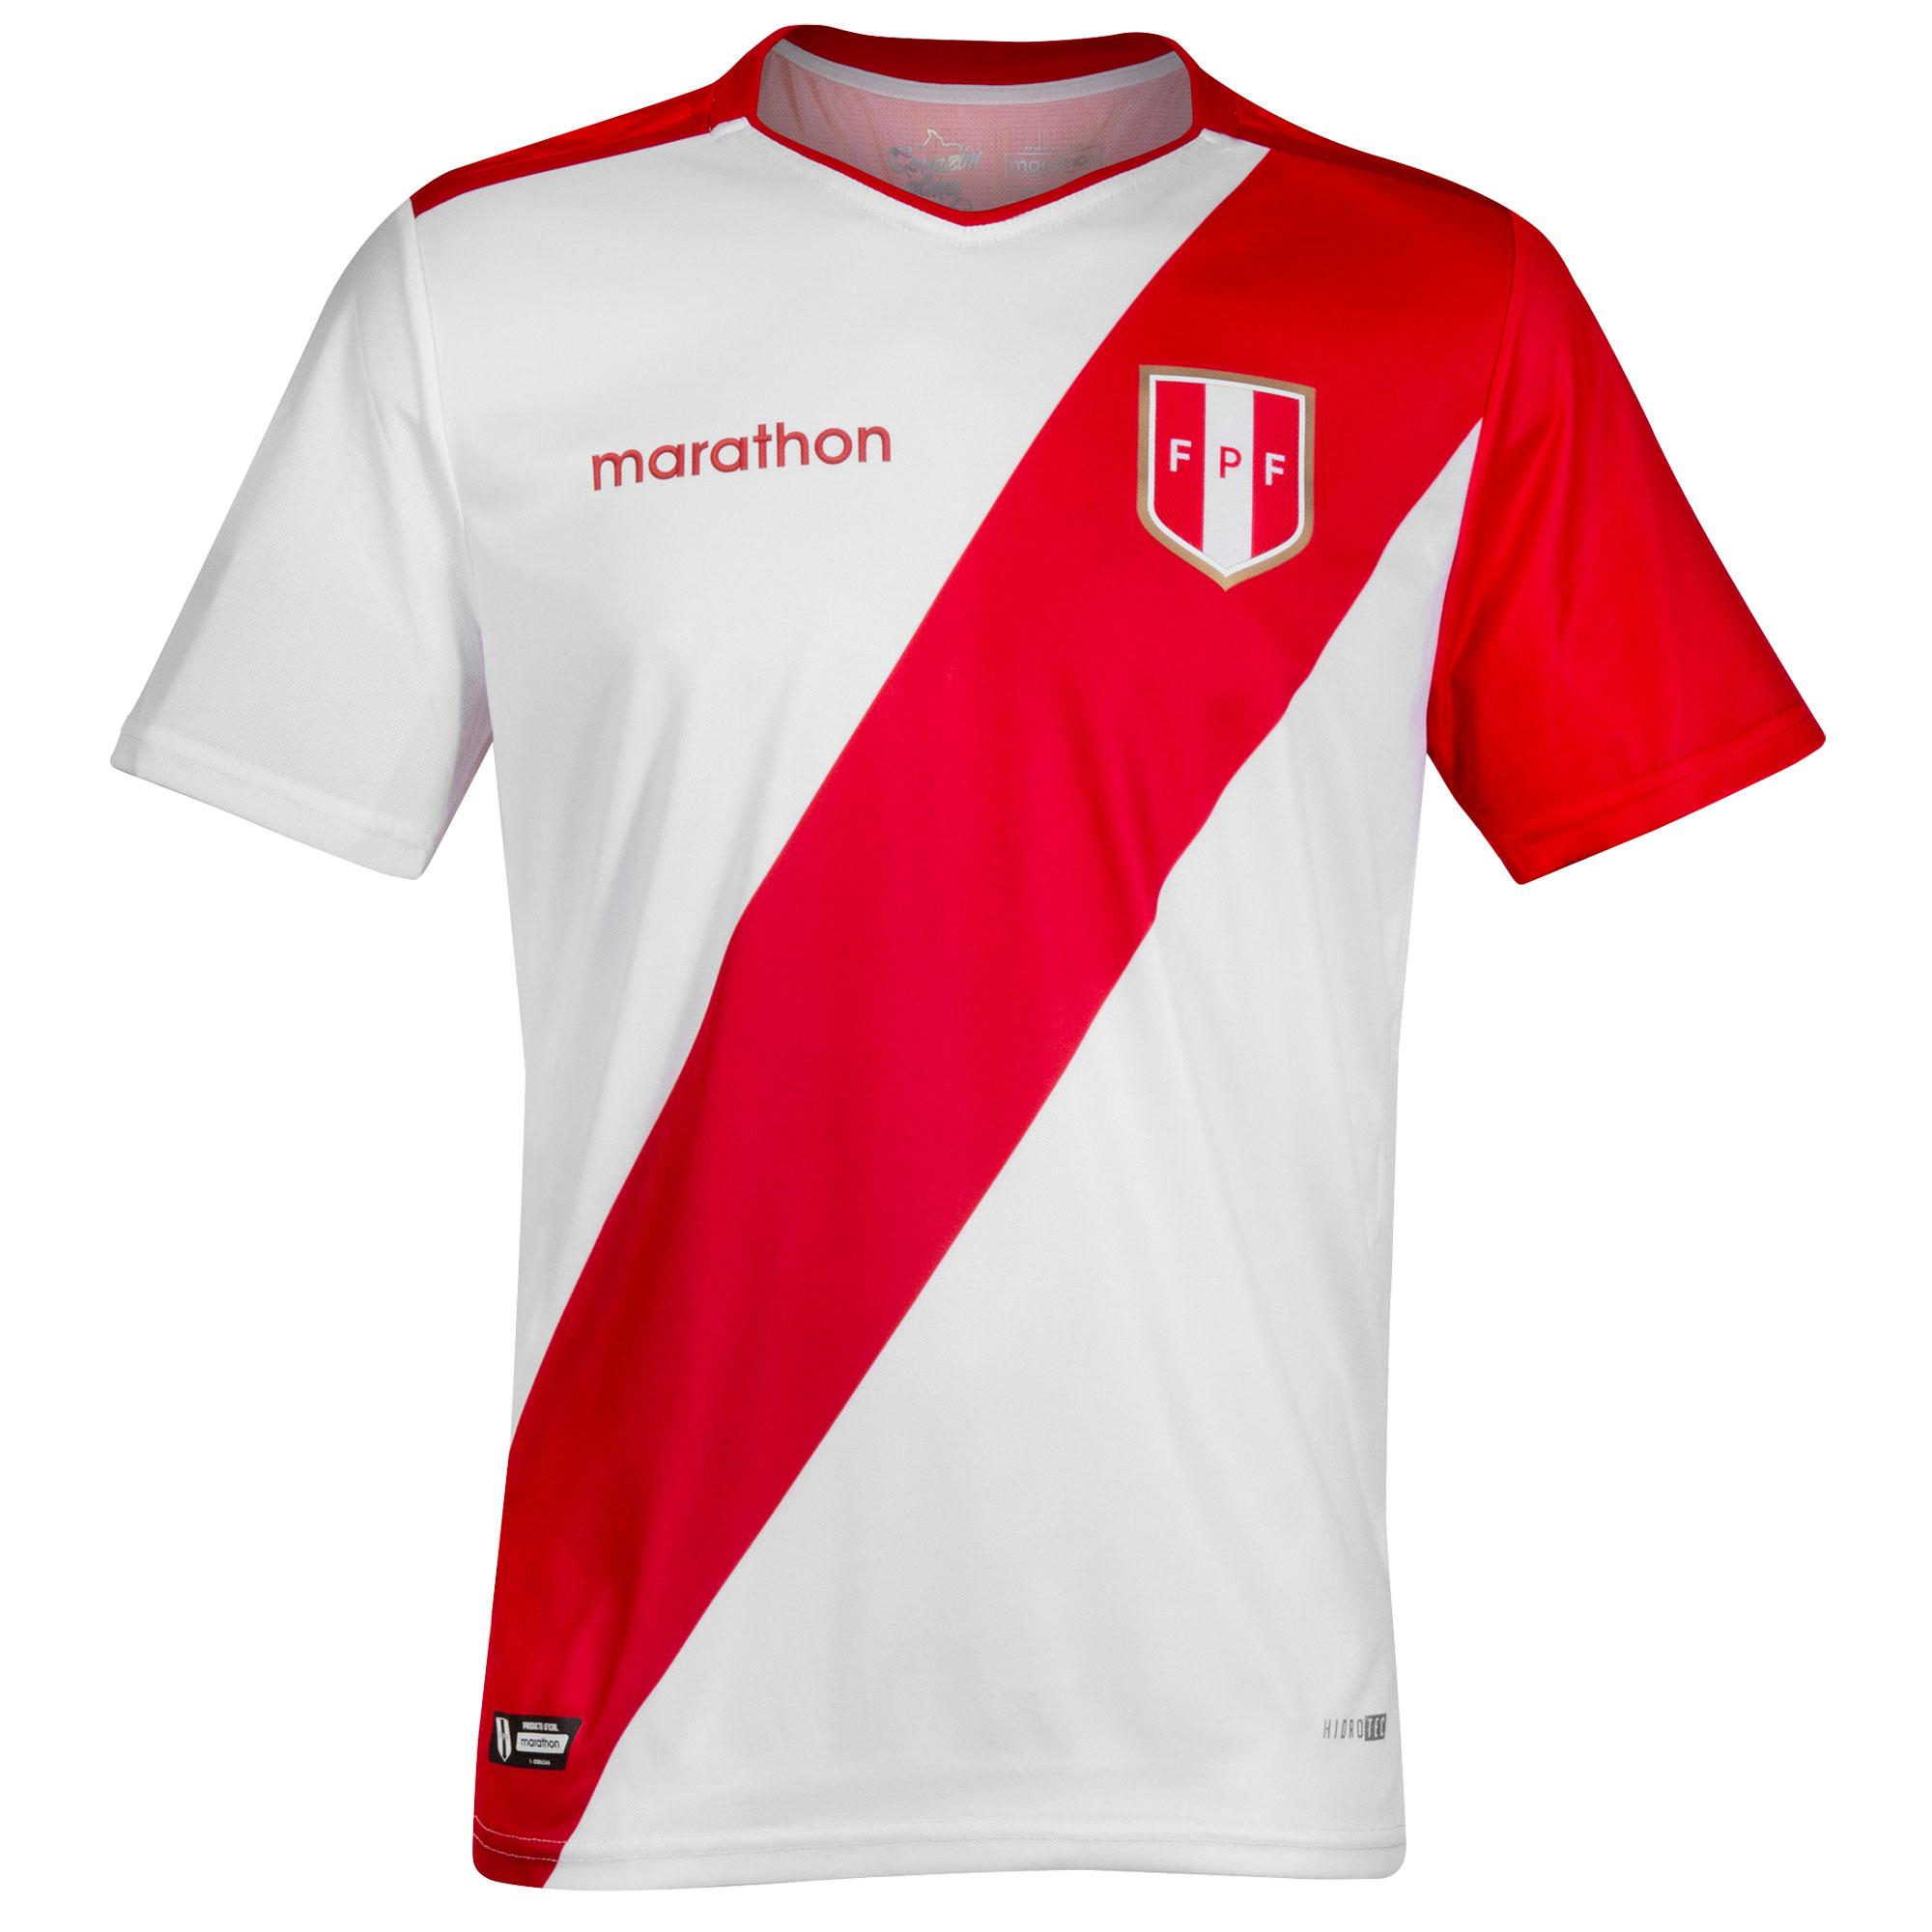 2019 Peru Home Shirt